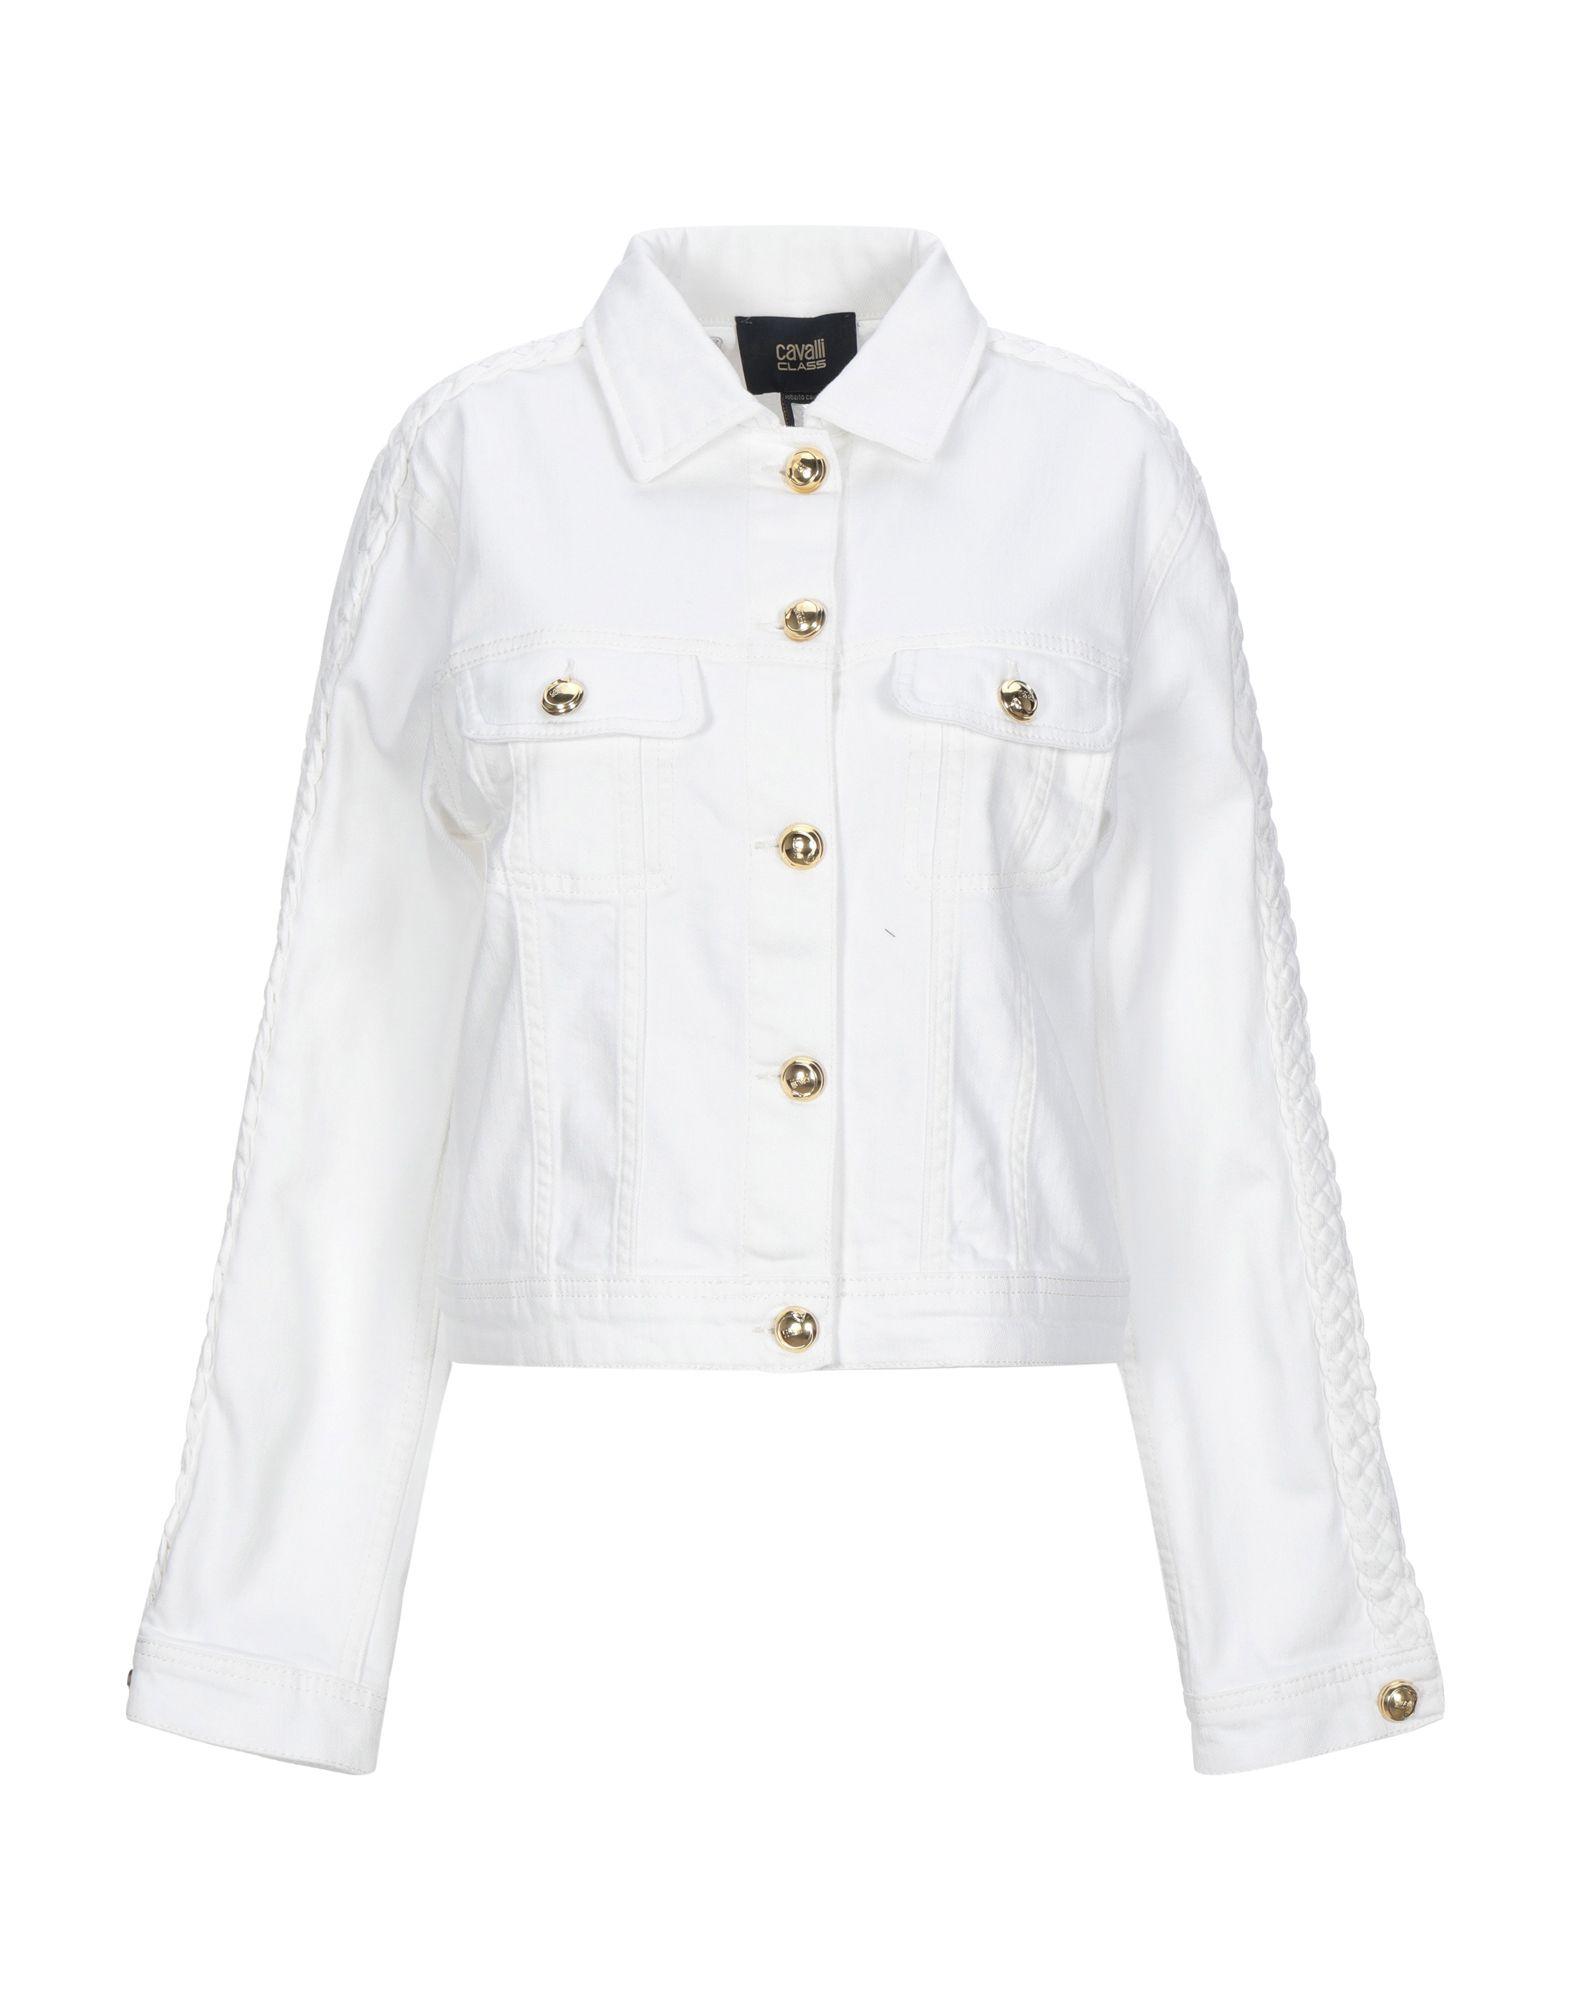 CAVALLI CLASS Джинсовая верхняя одежда just cavalli джинсовая верхняя одежда